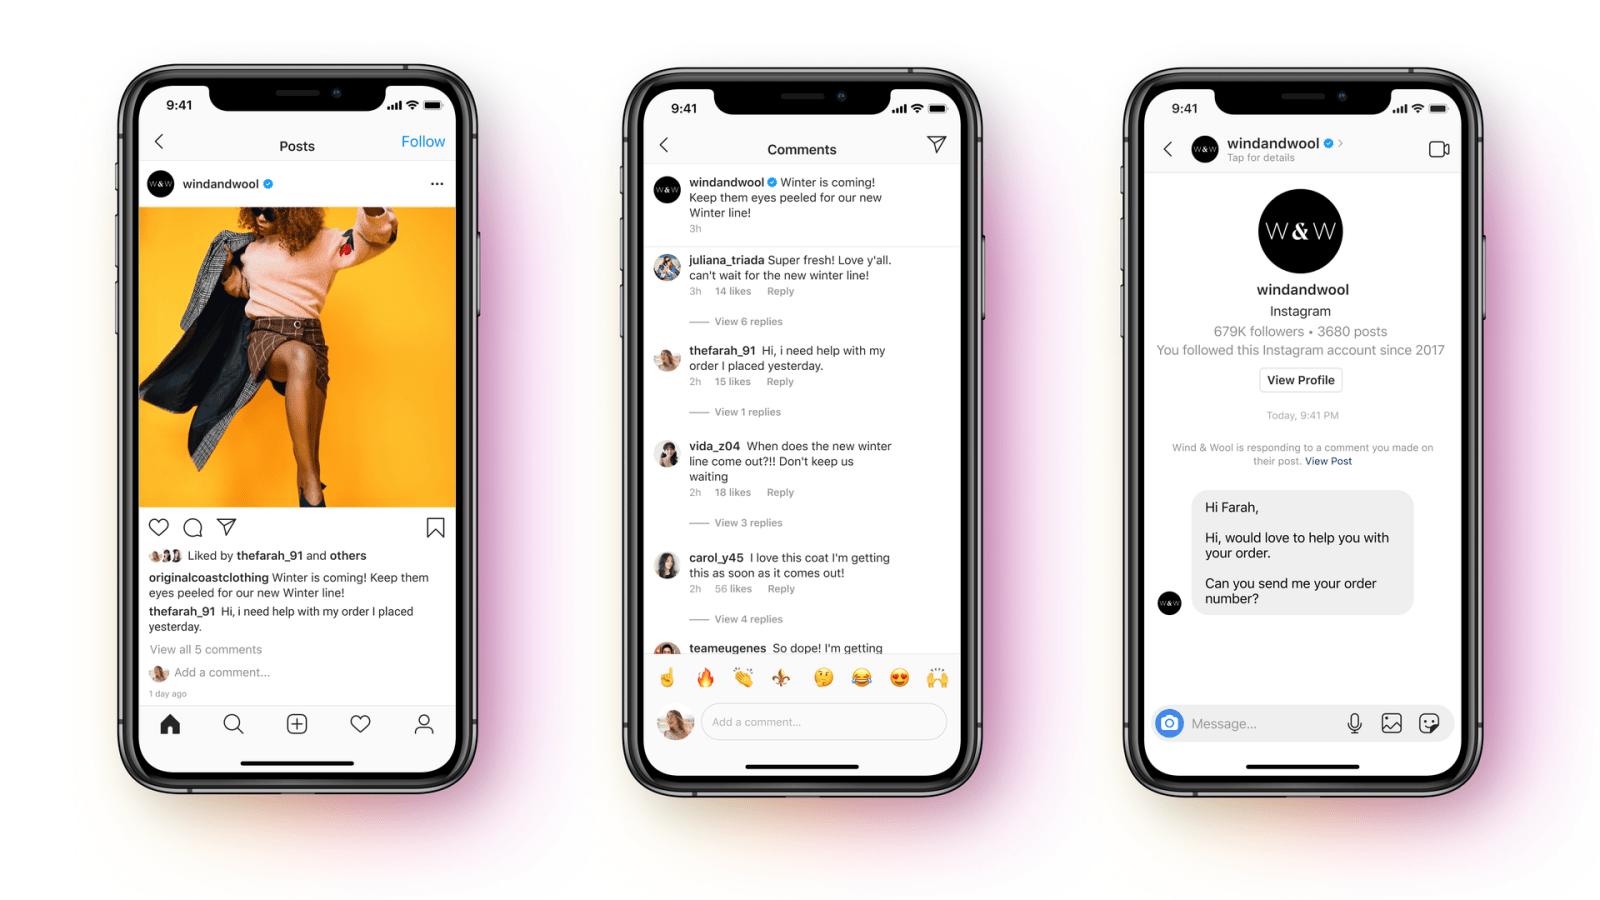 Facebook Update to Support New Messenger API for Instagram Messaging